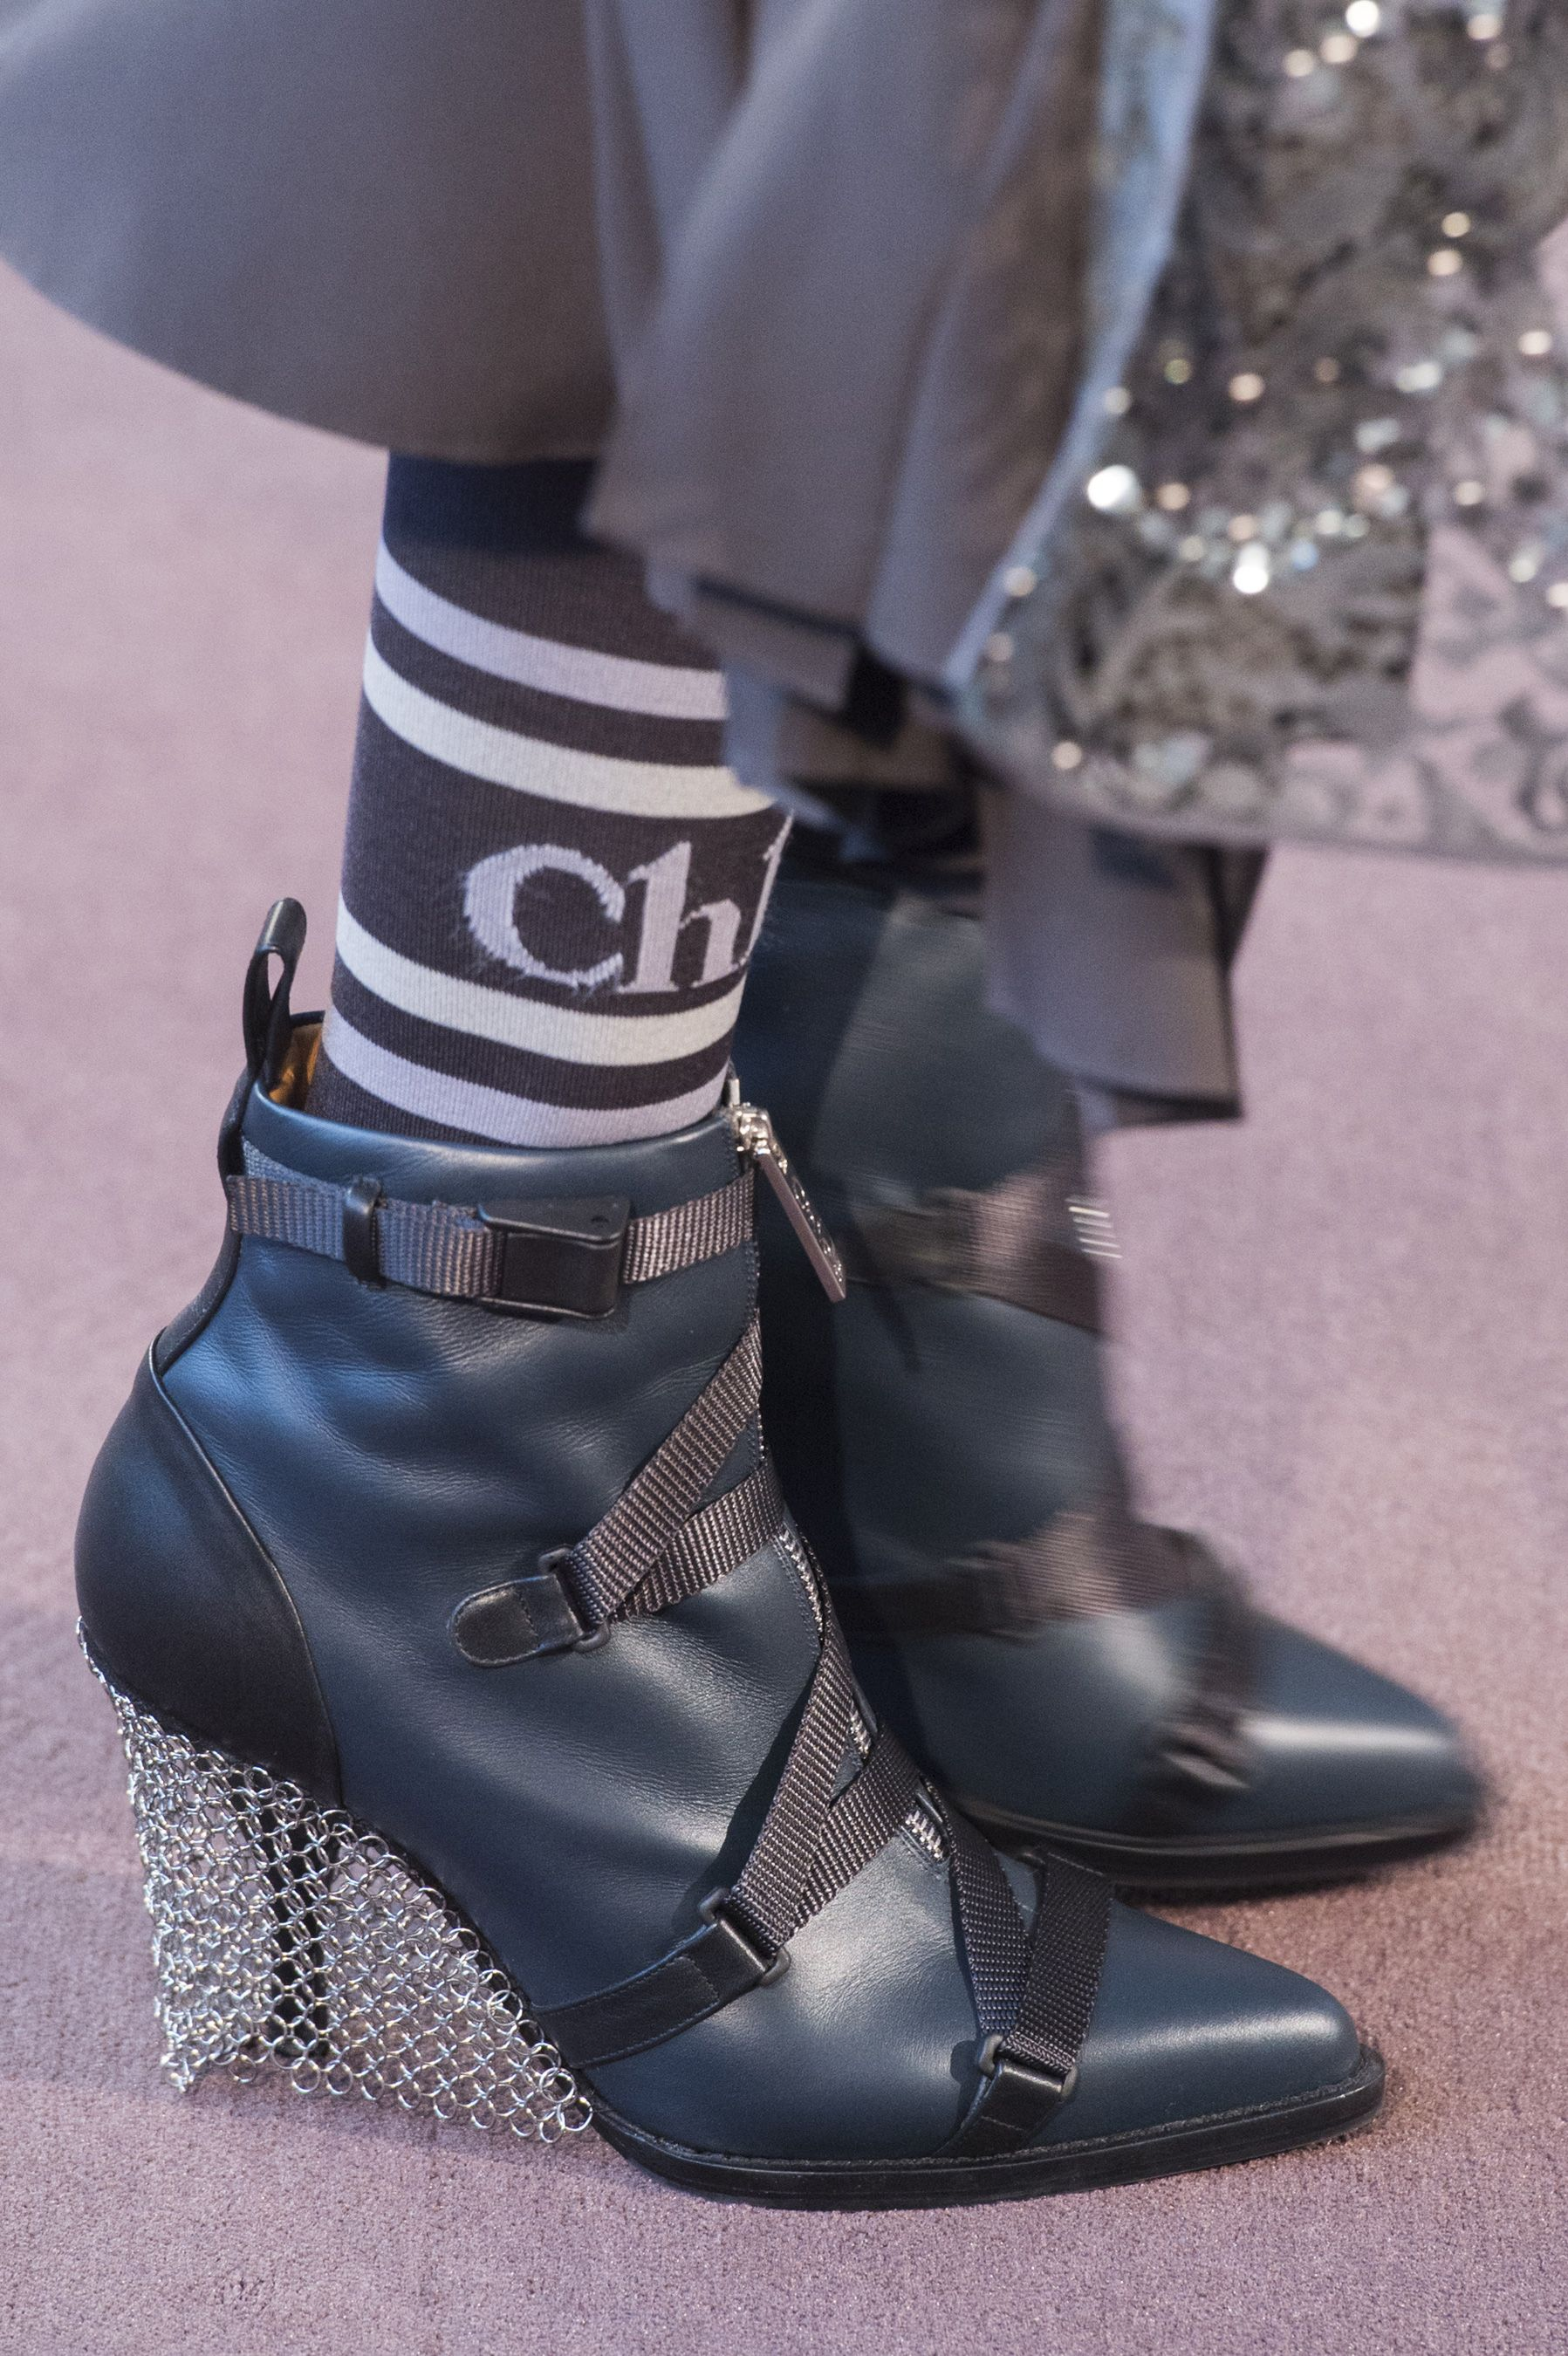 Chloe Fall 2018 Fashion Show Details